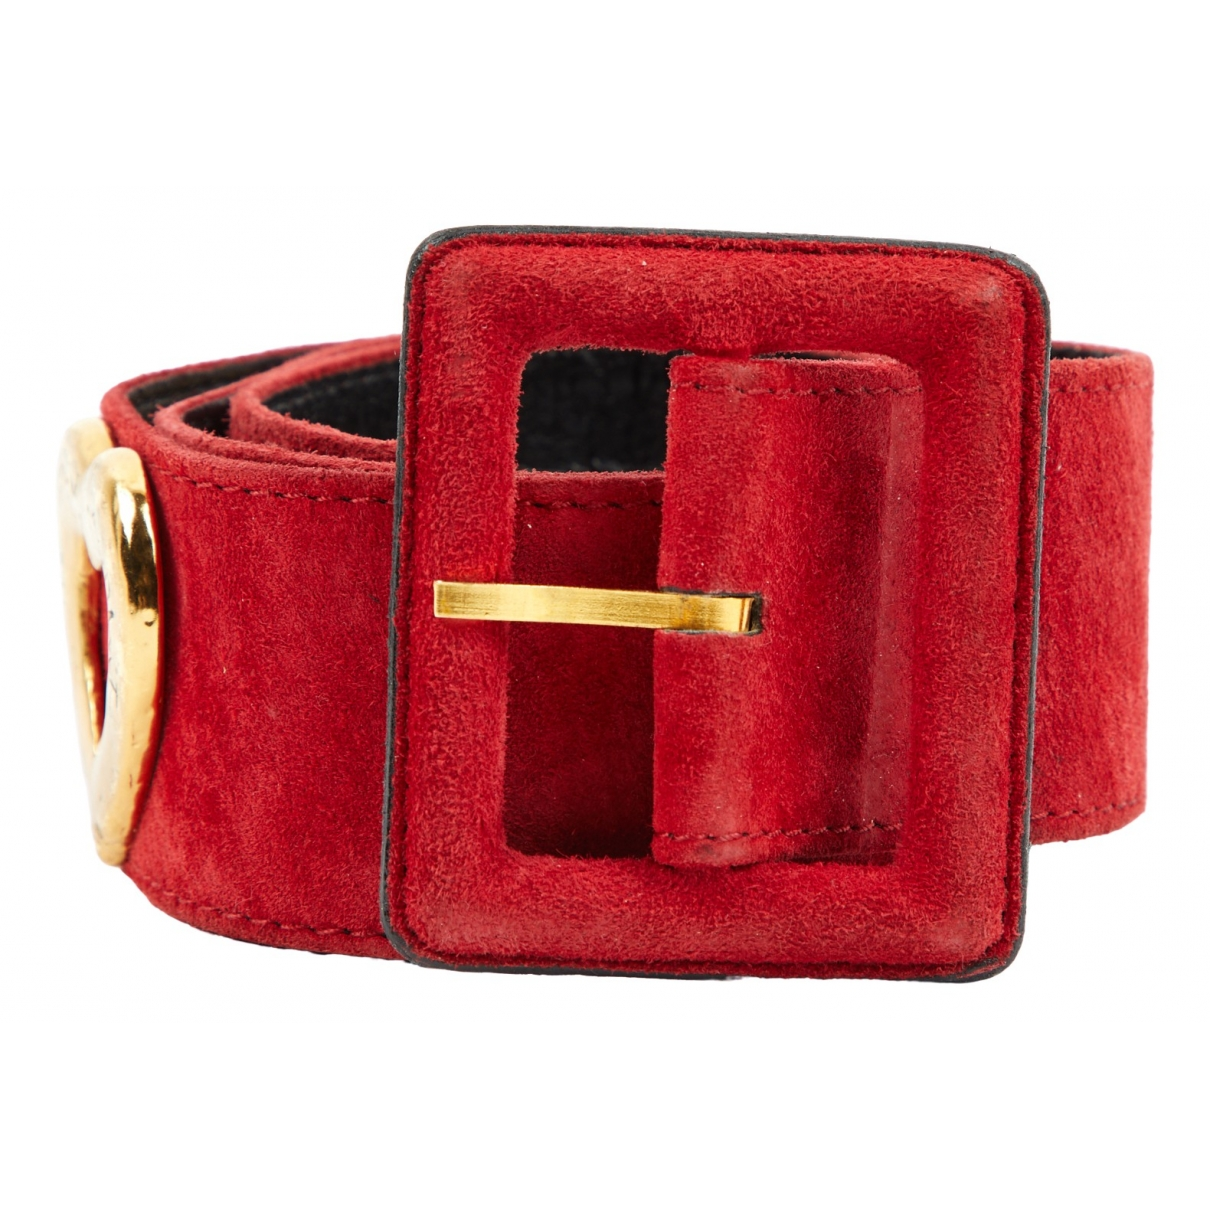 Yves Saint Laurent \N Red Suede belt for Women 80 cm